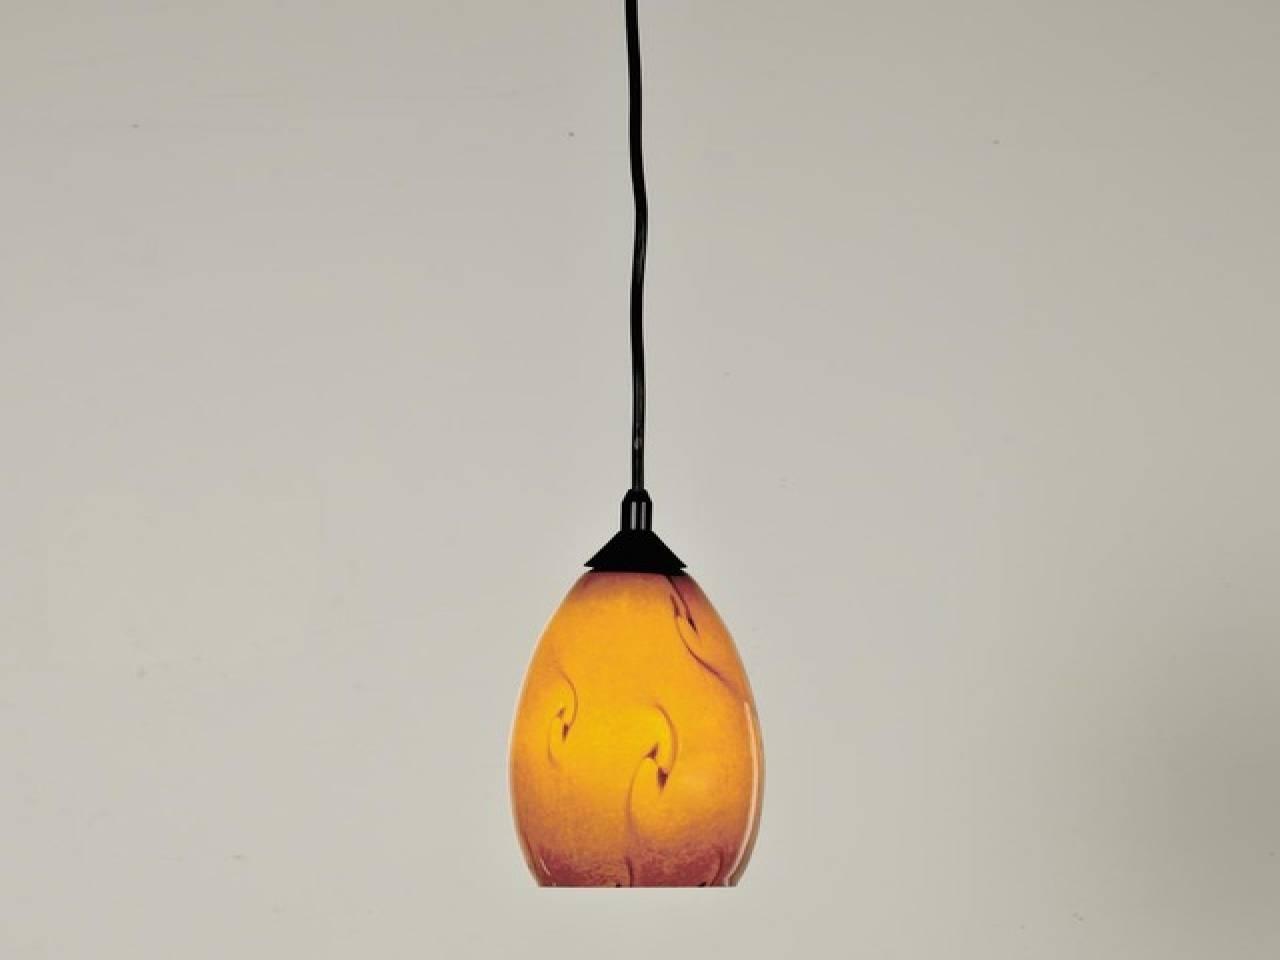 Stunning Murano Glass Pendant Lights 29 For Your Pendant Light within Murano Pendant Lights (Image 13 of 15)